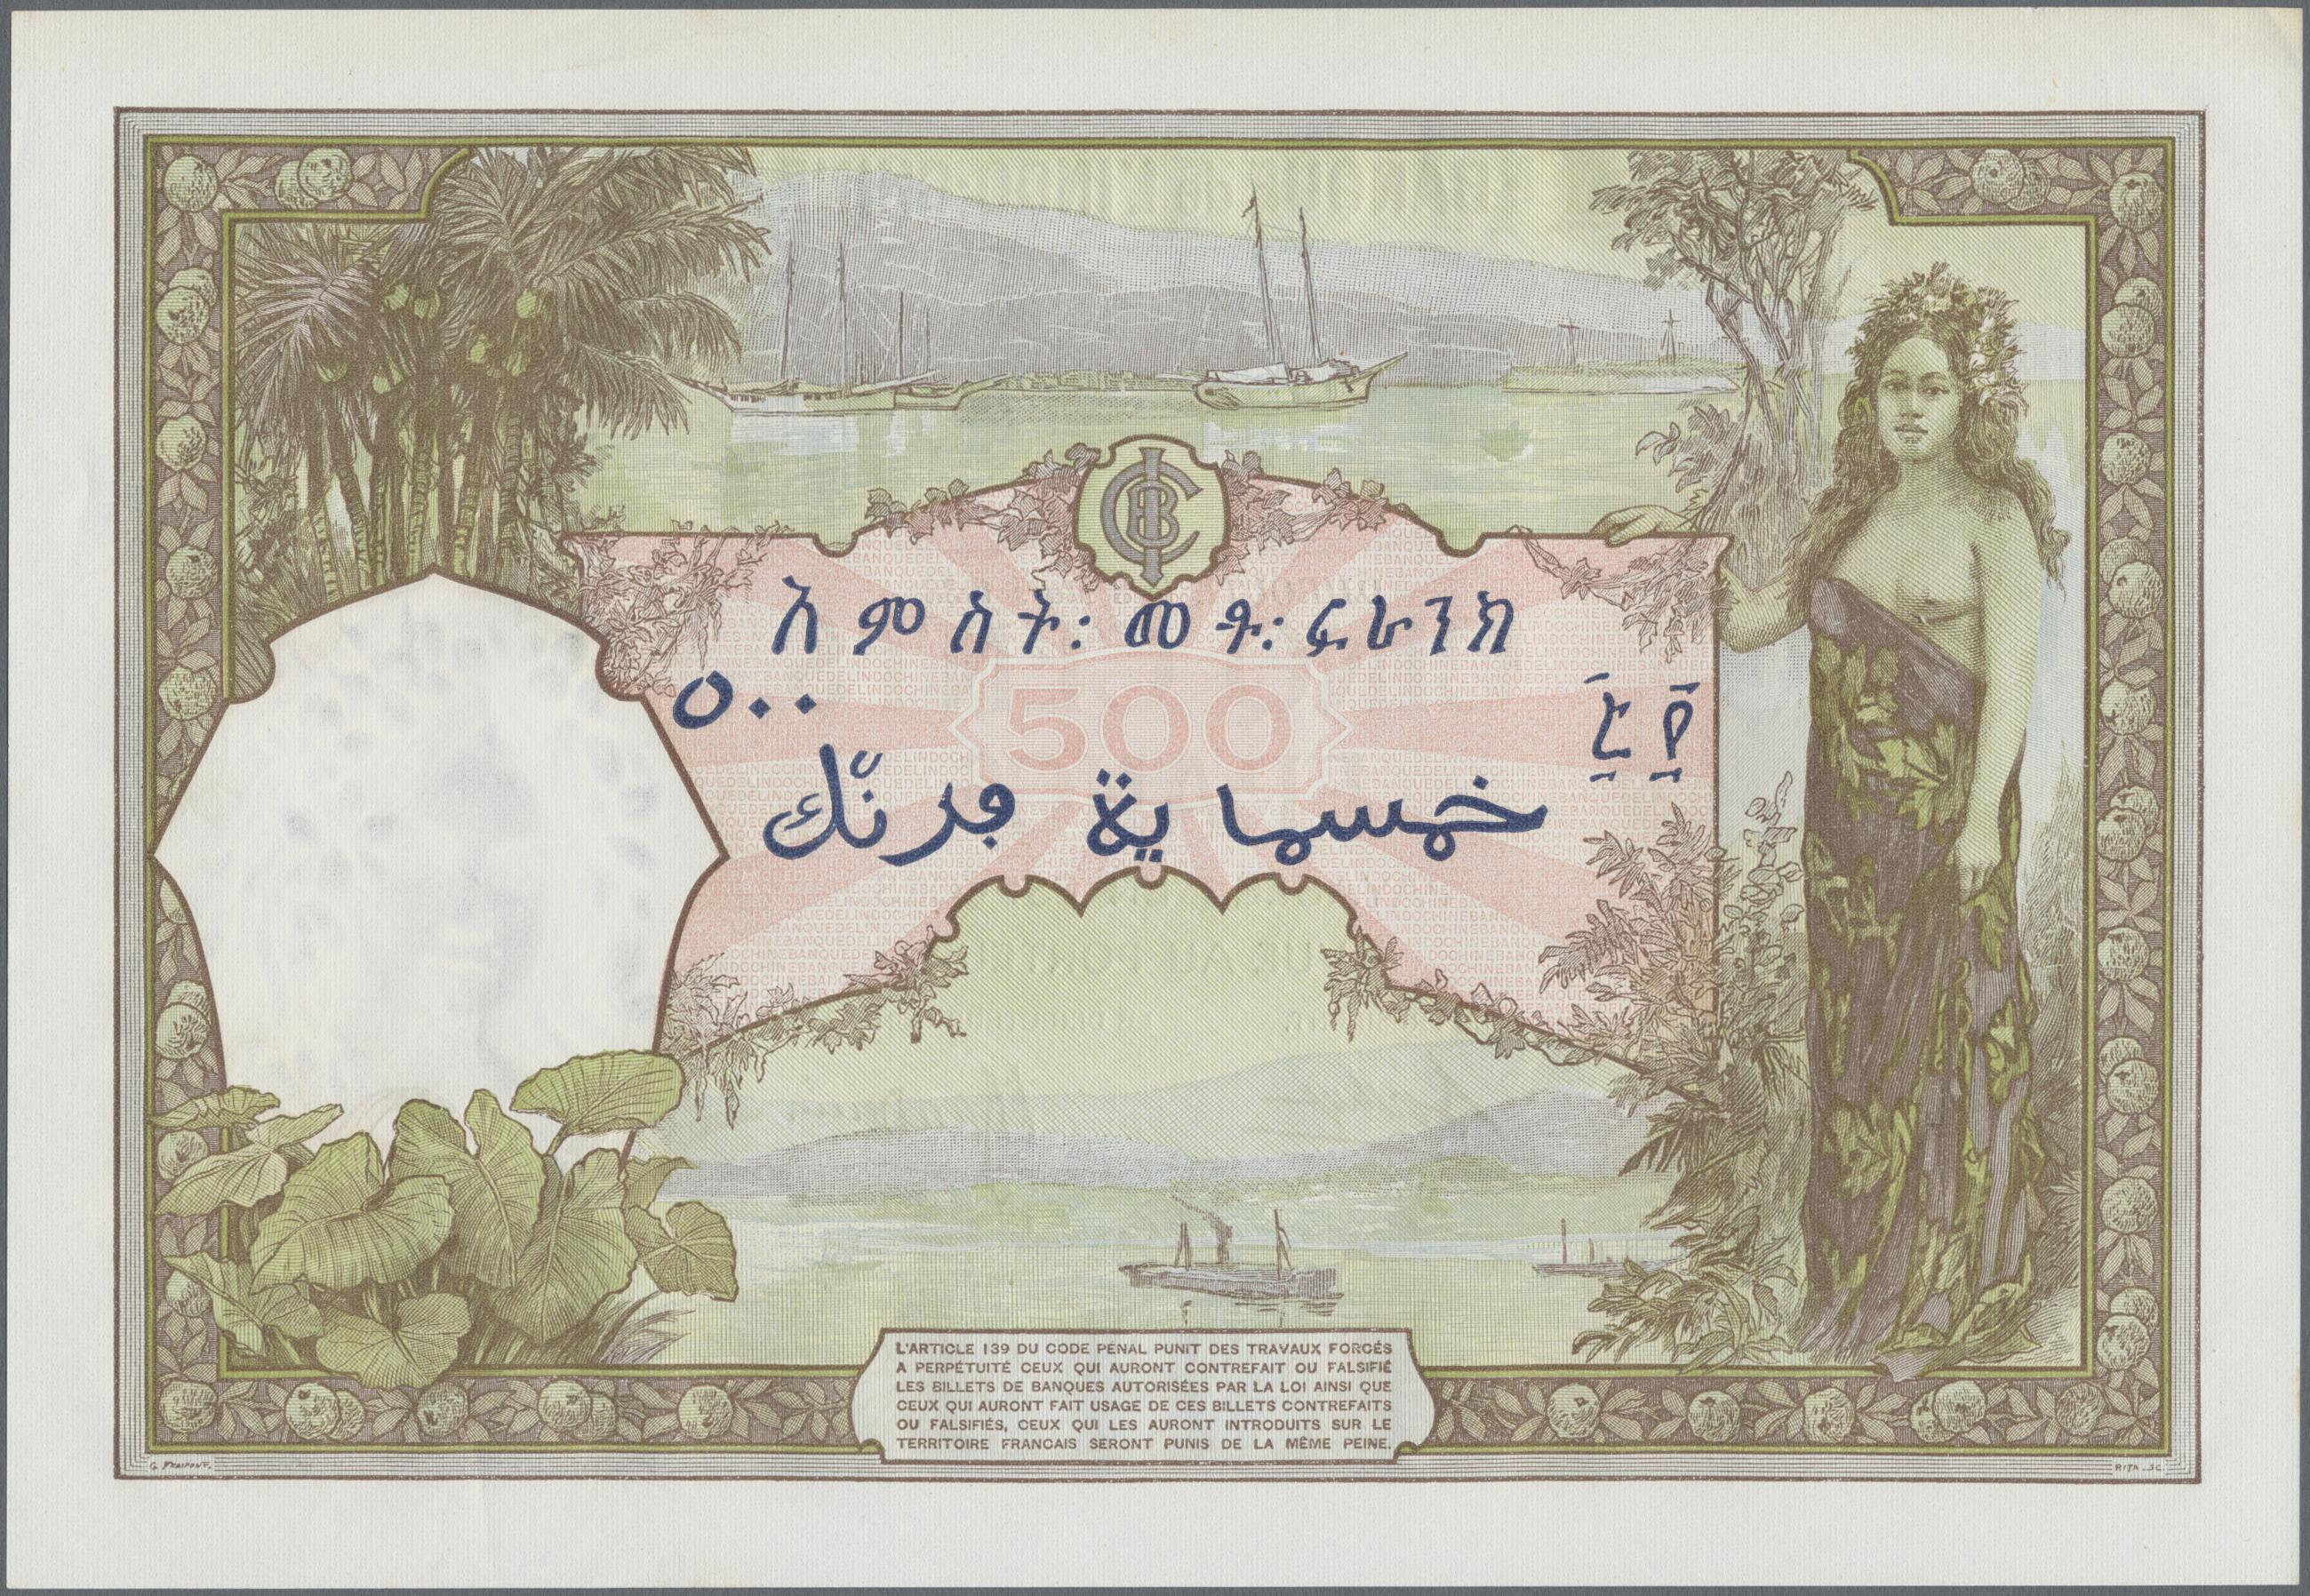 Lot 00346 - French Somaliland / Französisch Somaliland | Banknoten  -  Auktionshaus Christoph Gärtner GmbH & Co. KG Sale #48 The Banknotes